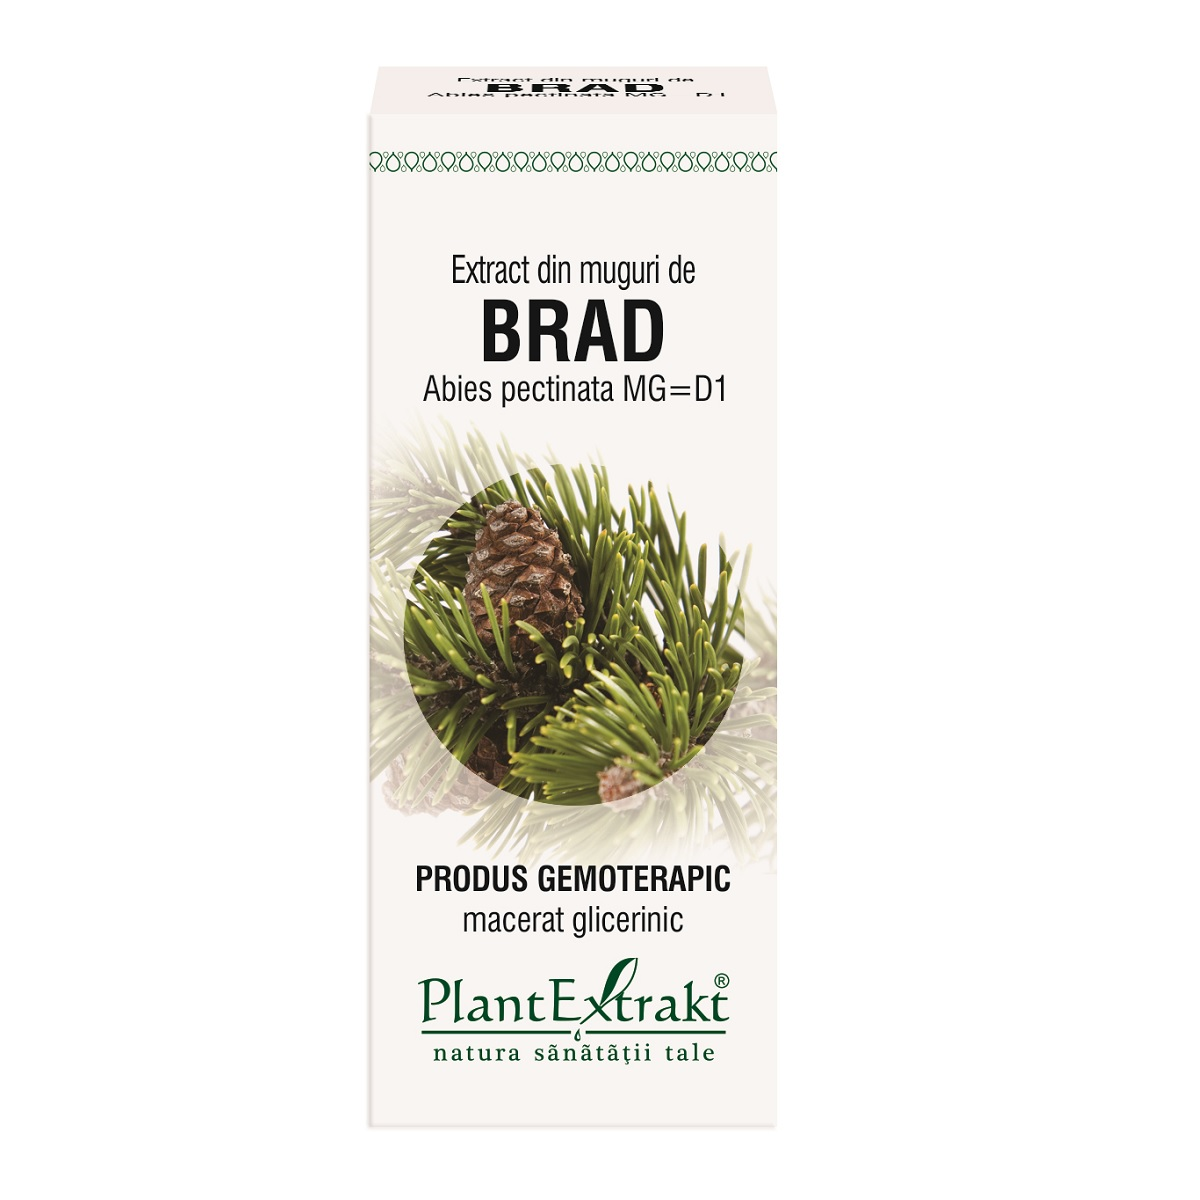 Extract din muguri de Brad, 50ml, Plantextrakt imagine produs 2021